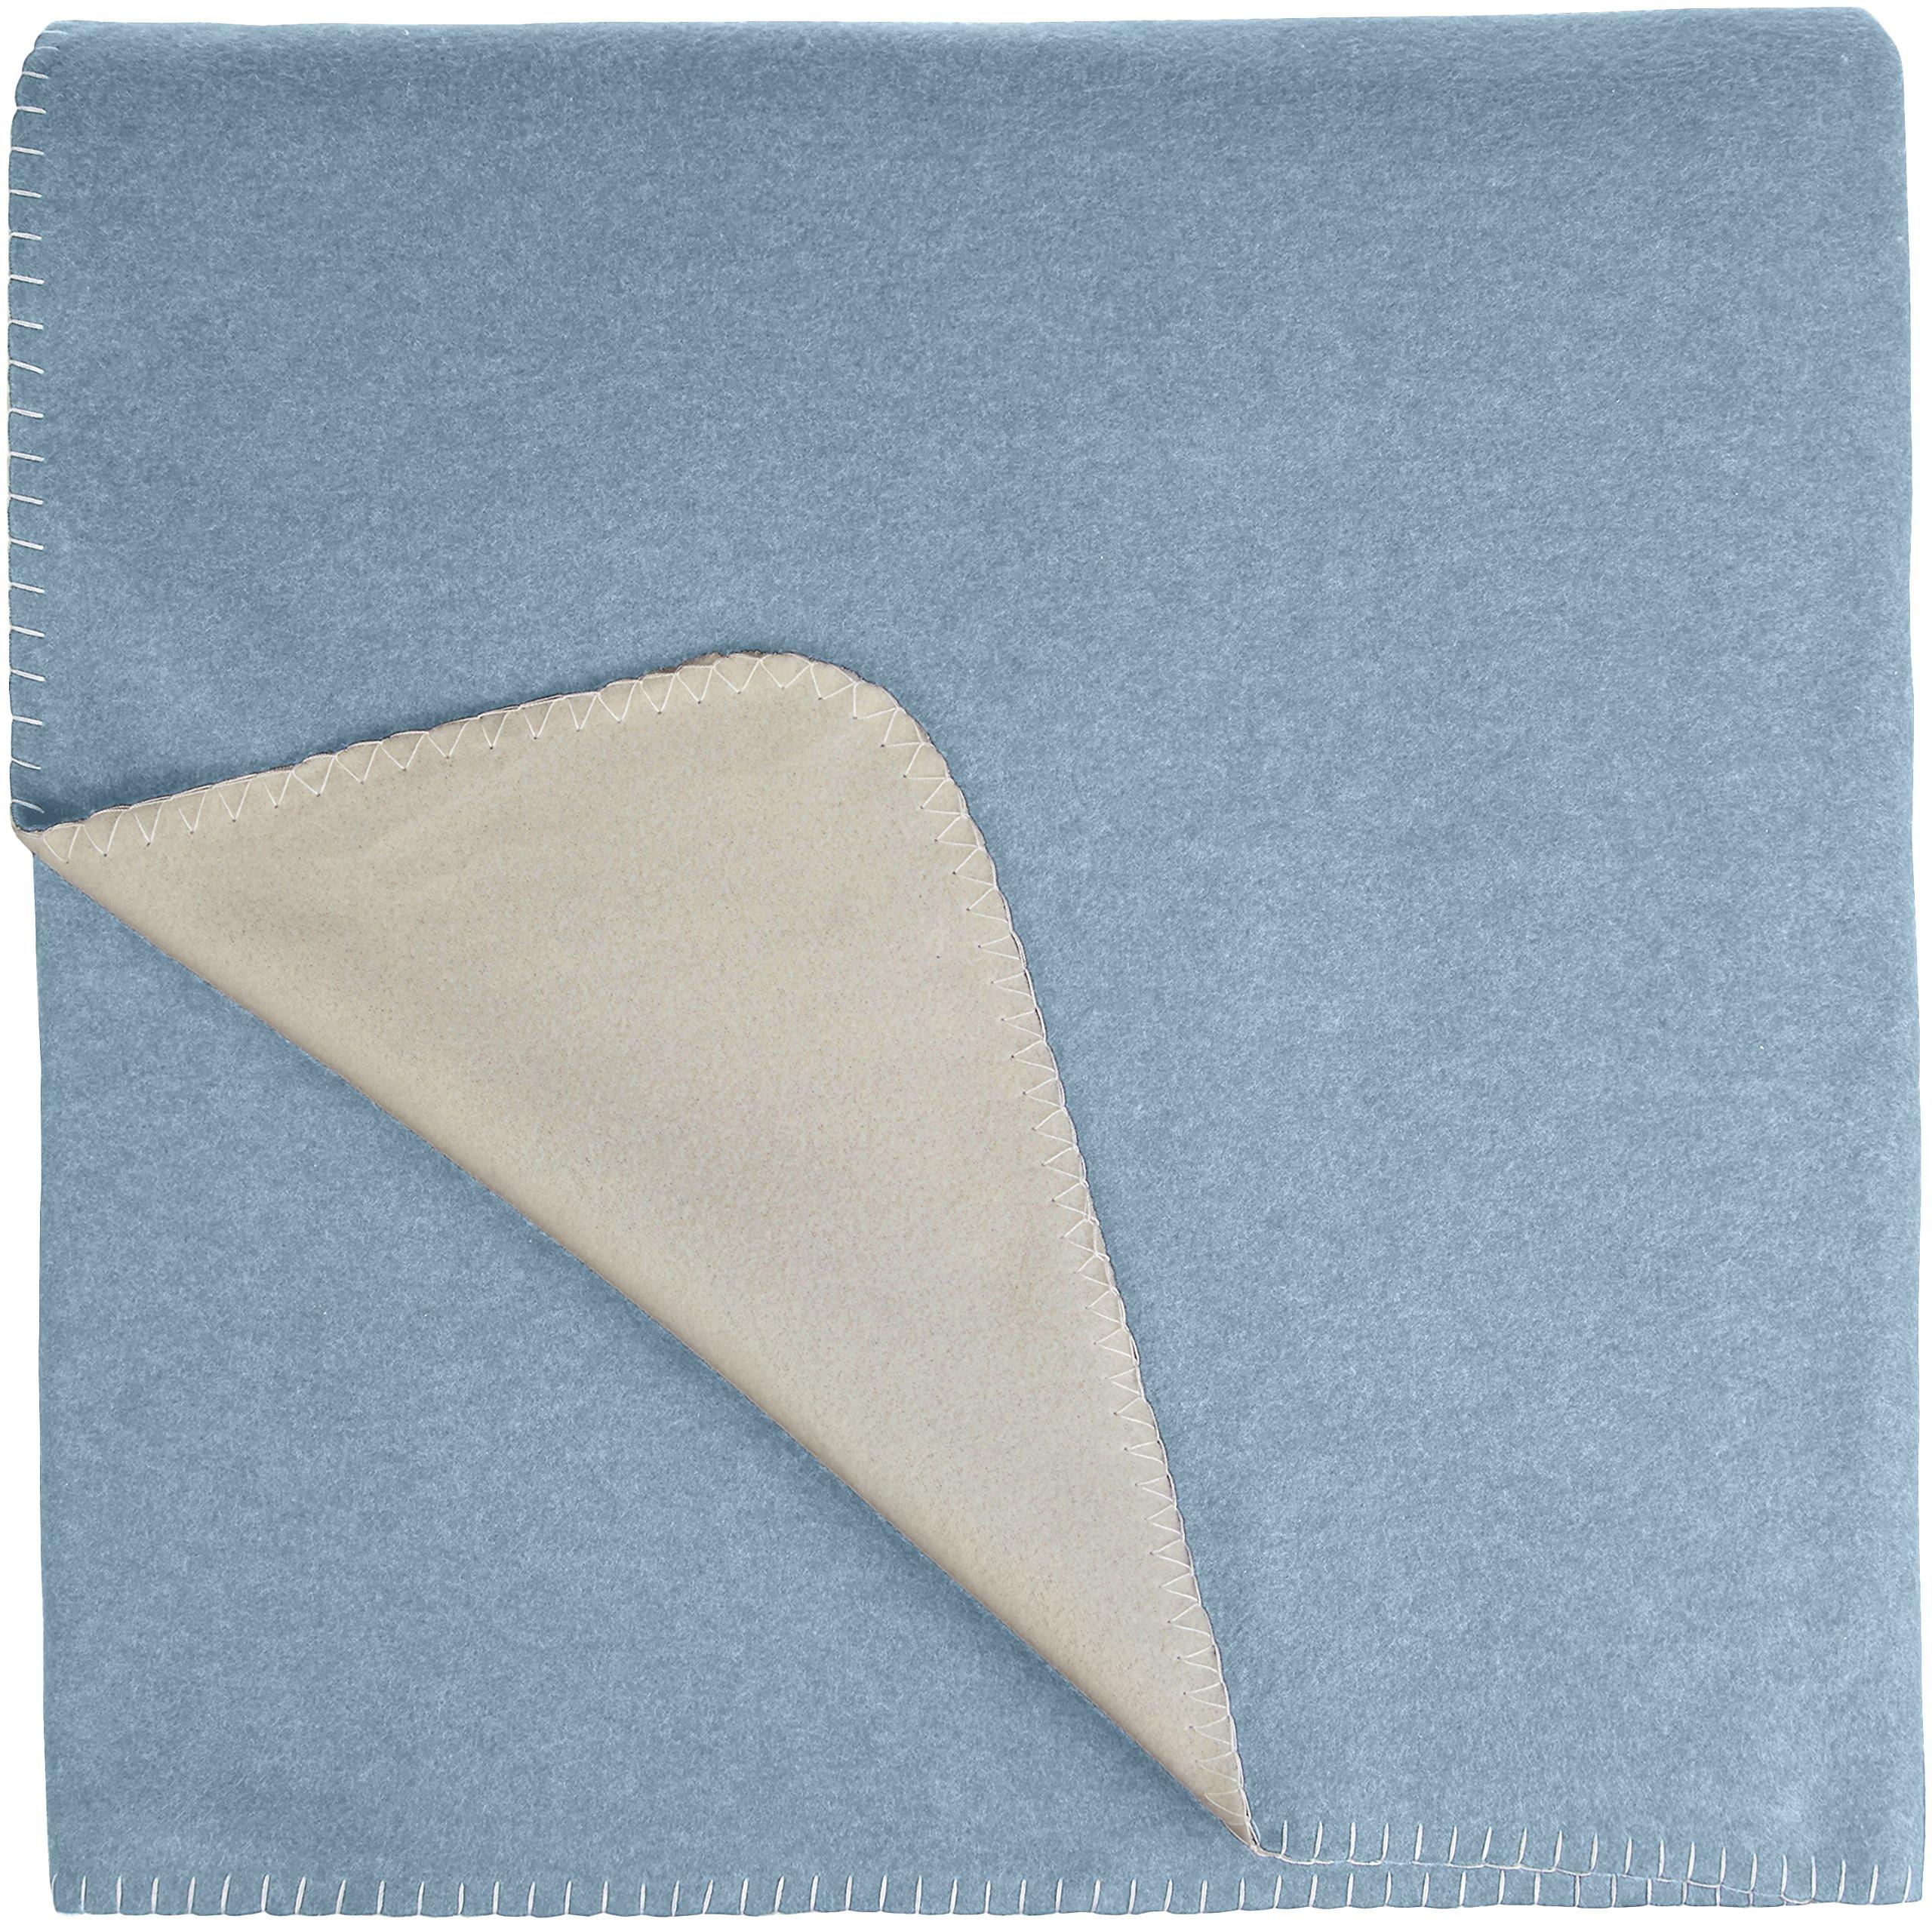 AmazonBasics Reversible Fleece Blanket - Throw, Spa Blue/Taupe by AmazonBasics (Image #5)